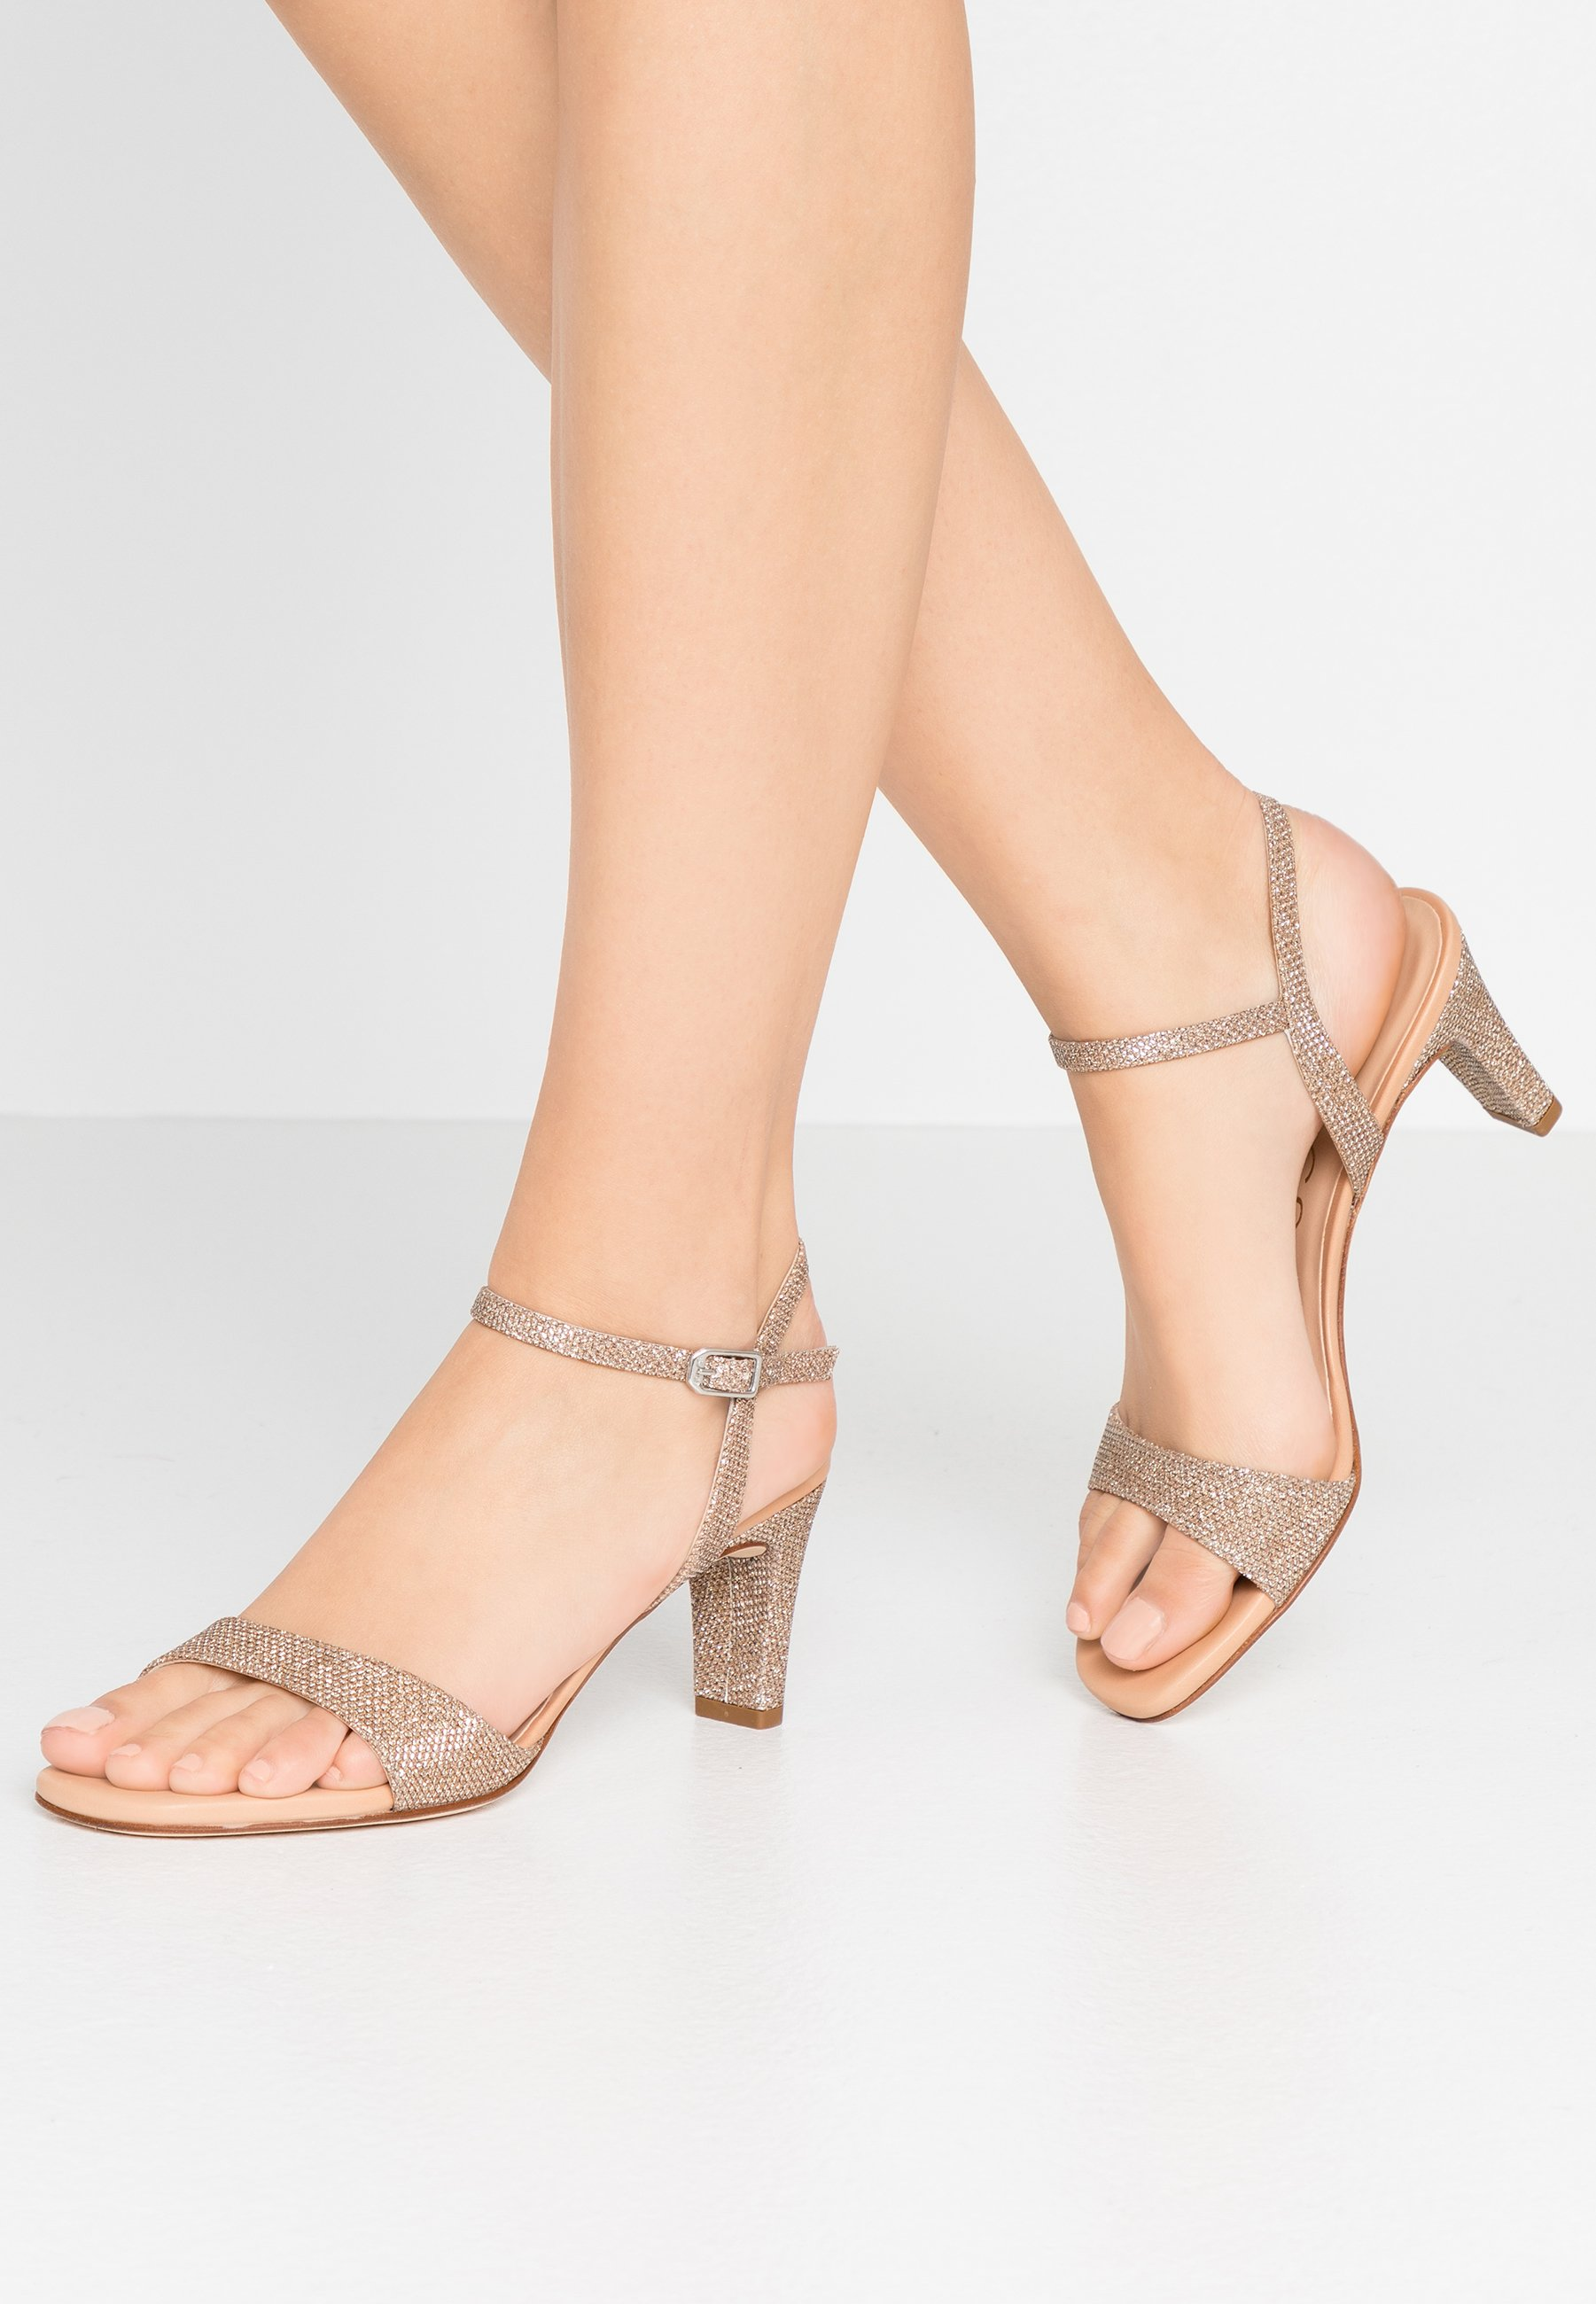 MECHI Sandals gold